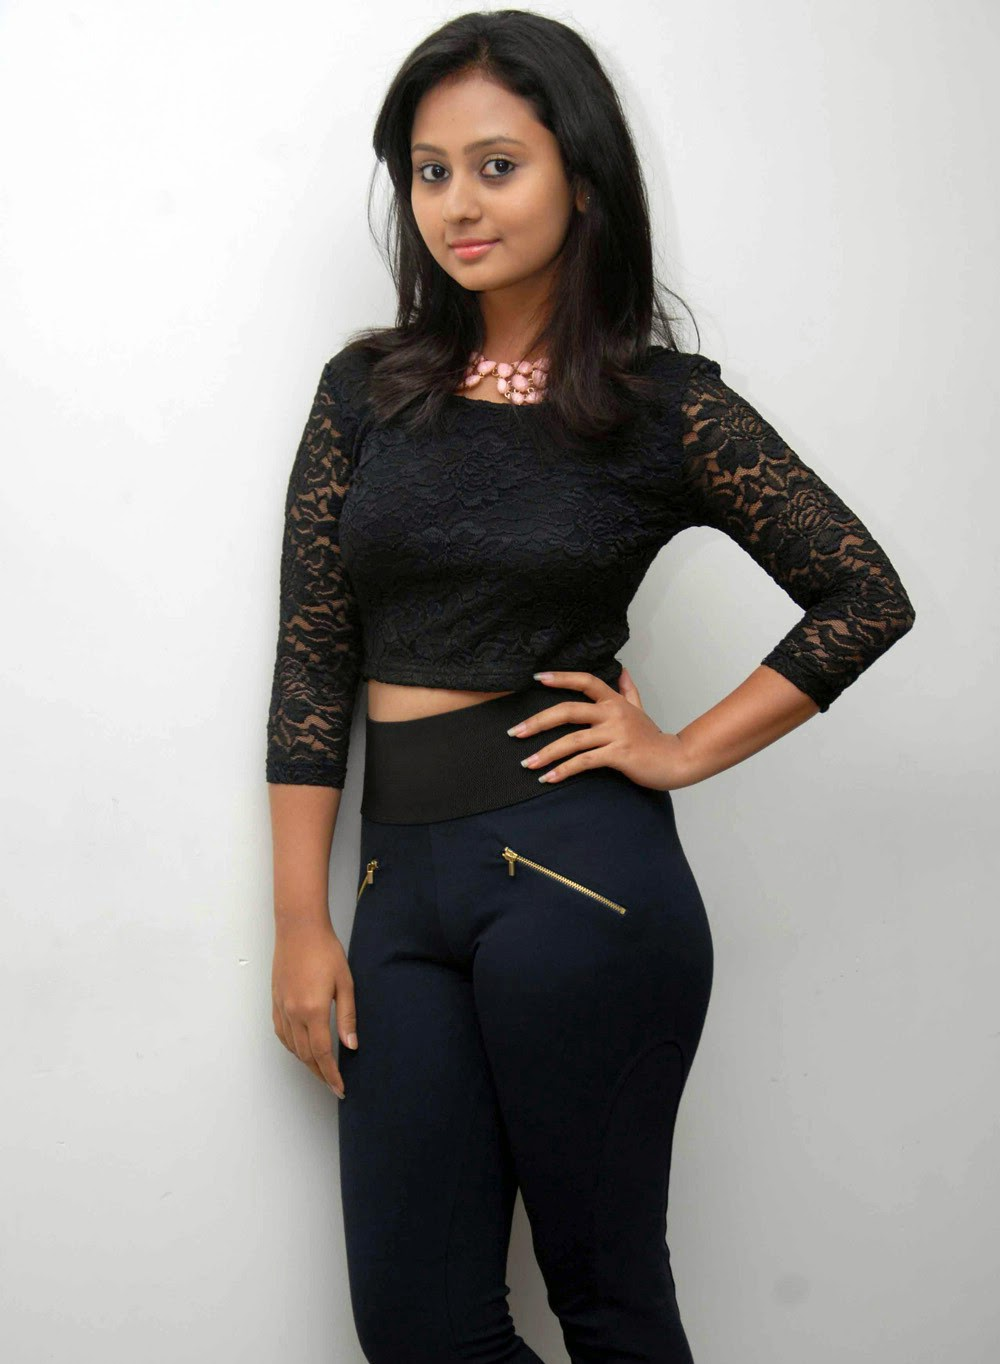 Sexy Kannda Young Actress Amulya With Skin Tight Leggins -6345